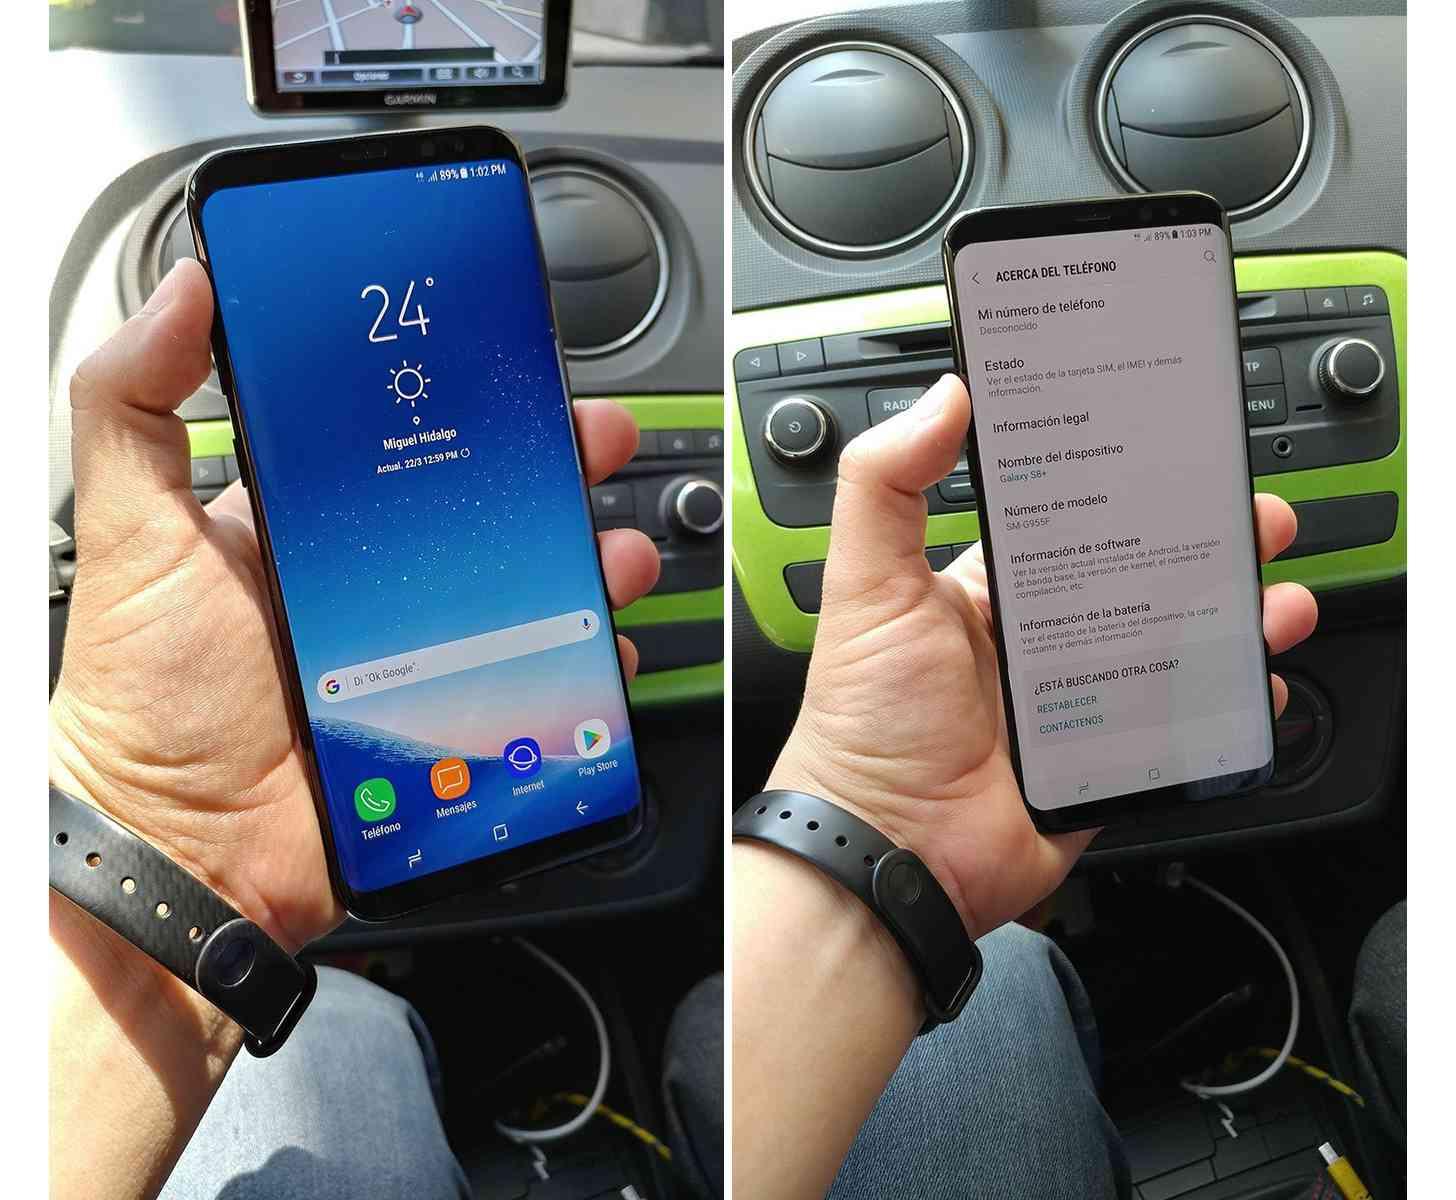 Samsung Galaxy S8+ hands-on photos leak